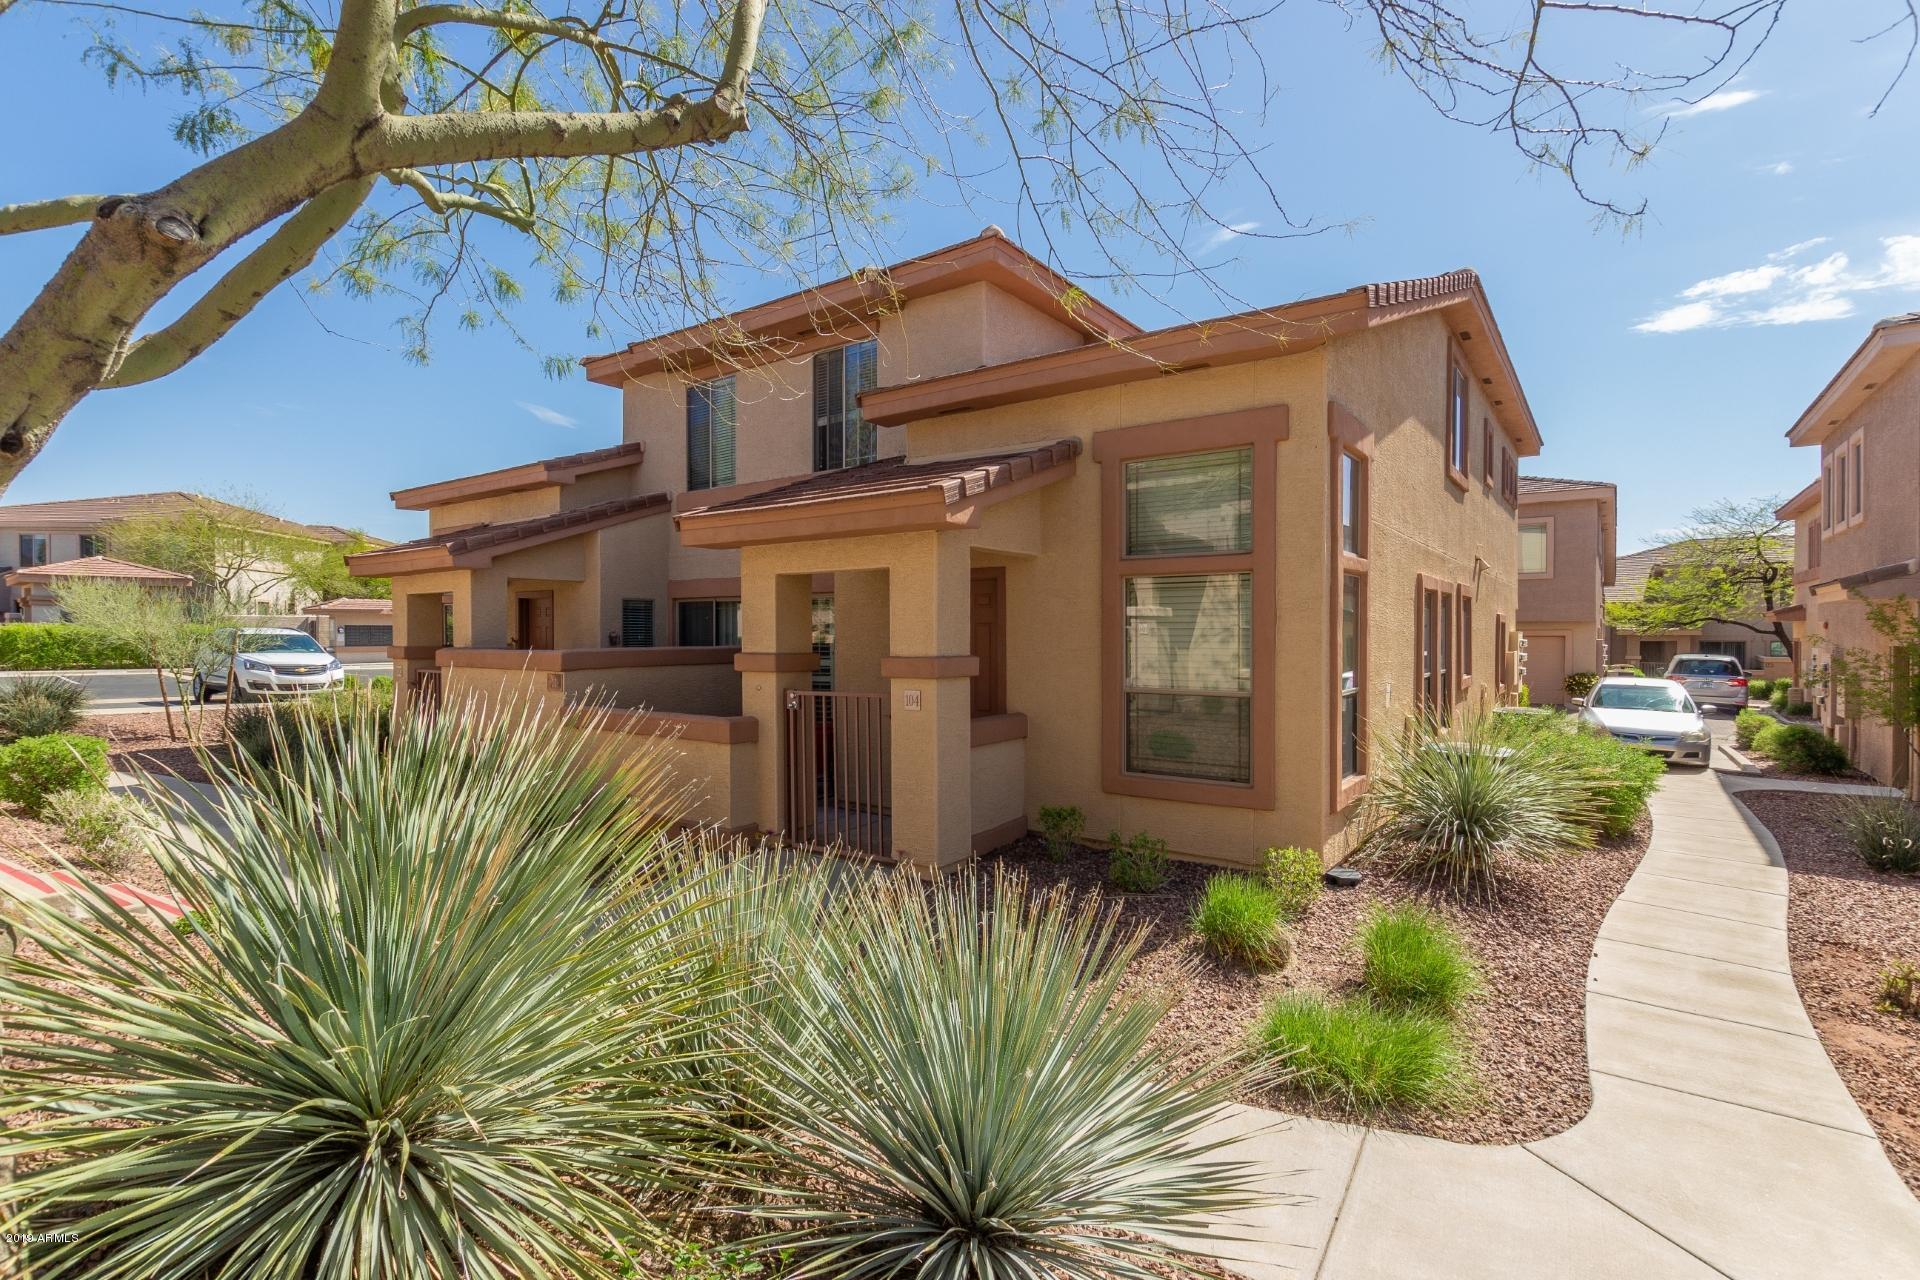 42424 N GAVILAN PEAK Parkway, Anthem in Maricopa County, AZ 85086 Home for Sale